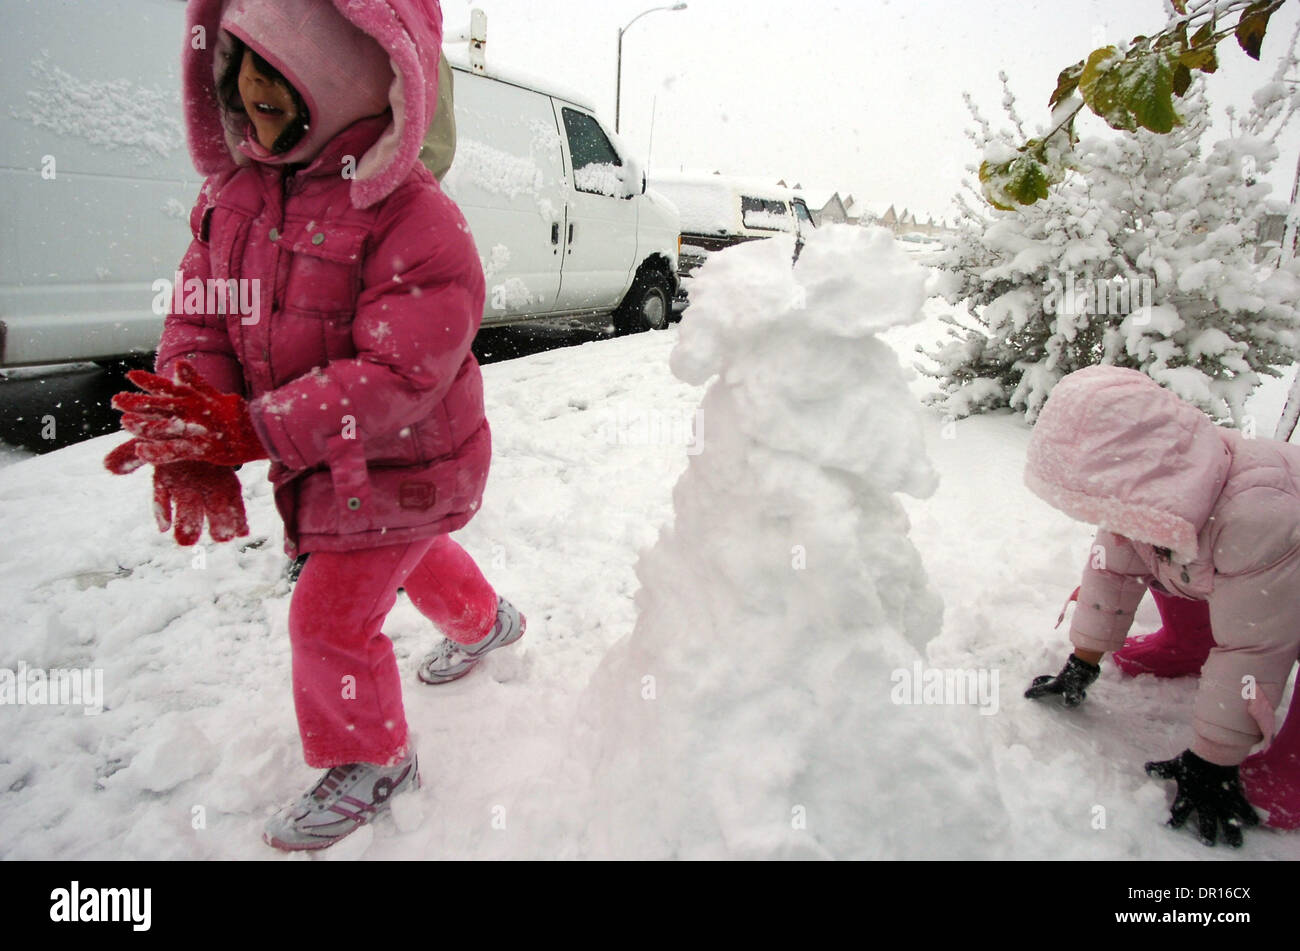 Dec 17, 2008 - Adelanto, California, USA - Snow Sisters, BRIANNA HERRERA, 4, left, SAMANTHA HERRERA, 2, and KIMBERLY HERRERA, 3, build a snowman on their Adelanto, Calif. driveway as the High Desert experienced a day of heavy snow on Wednesday, Dec. 17,  2008. (Credit Image: © Eric Reed/ZUMA Press) - Stock Image